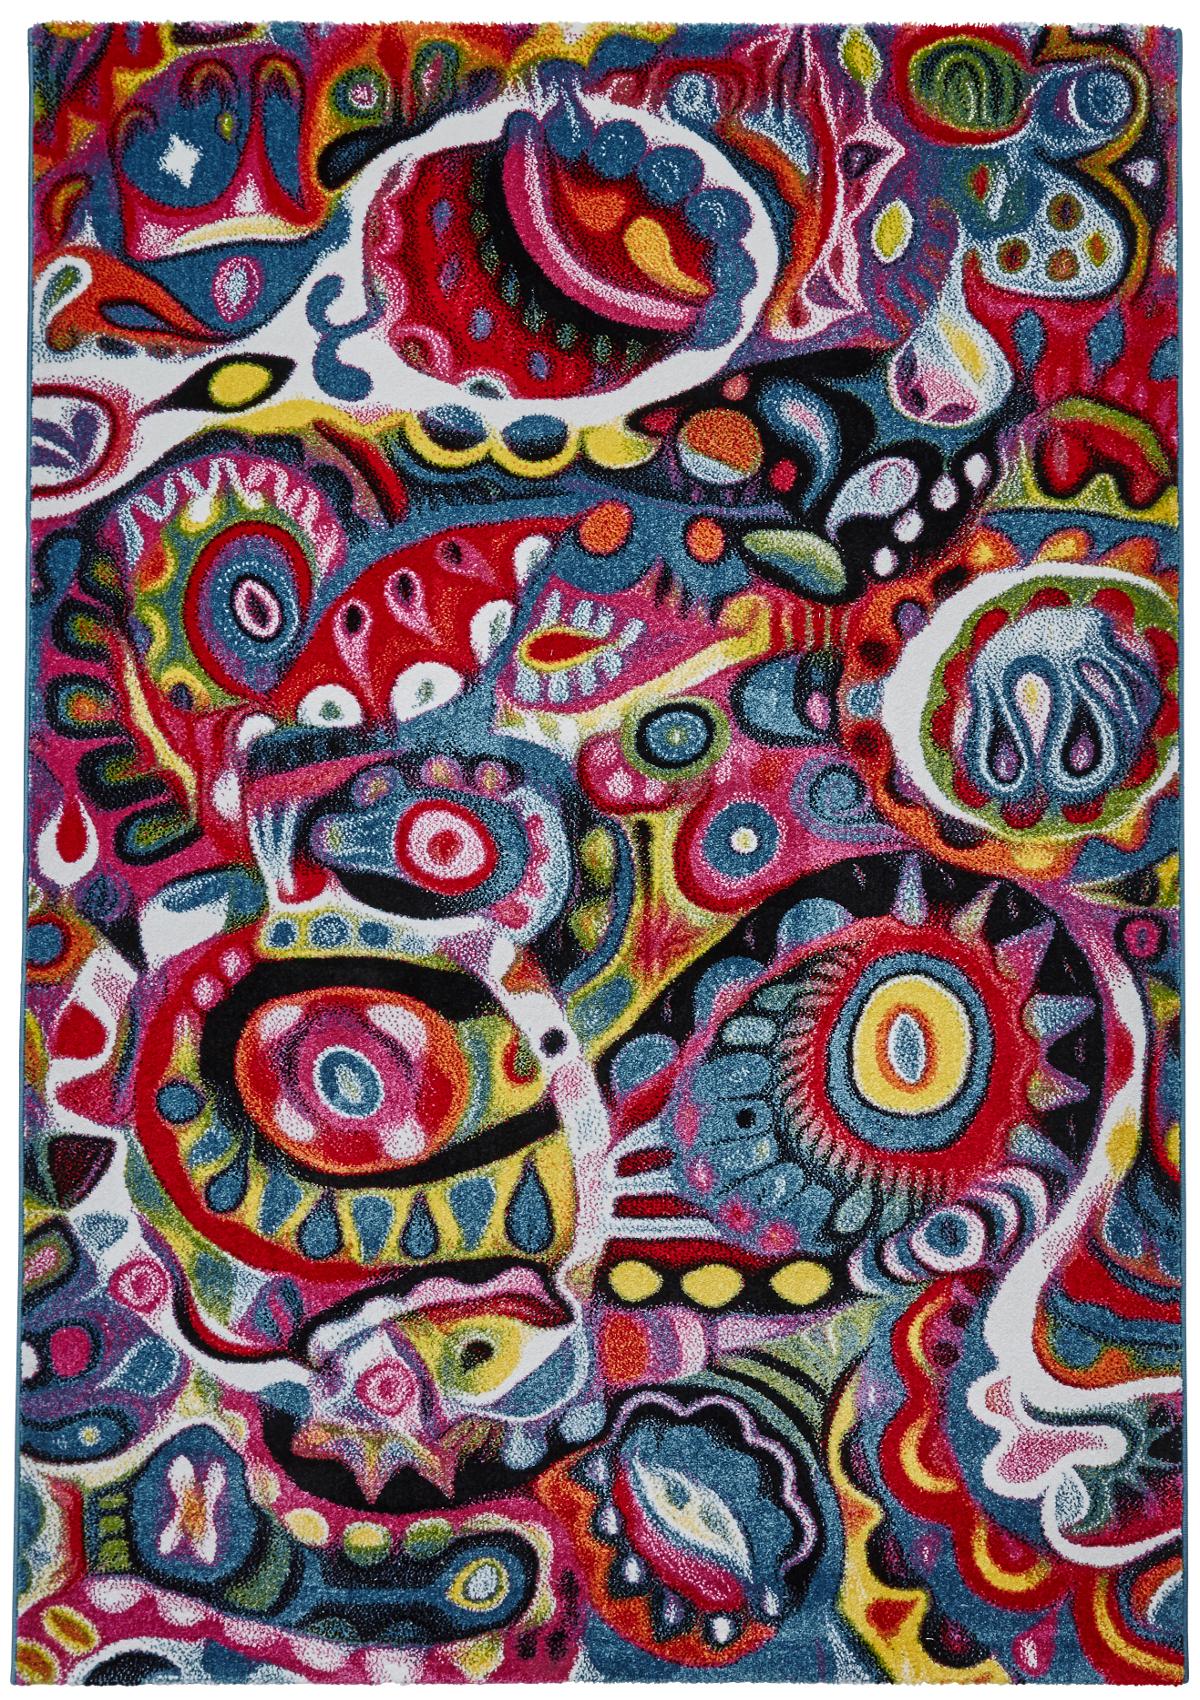 Fair Trade Rugs Vibrant Modern Sunrise Rug Bright Multi Coloured Floor Mat